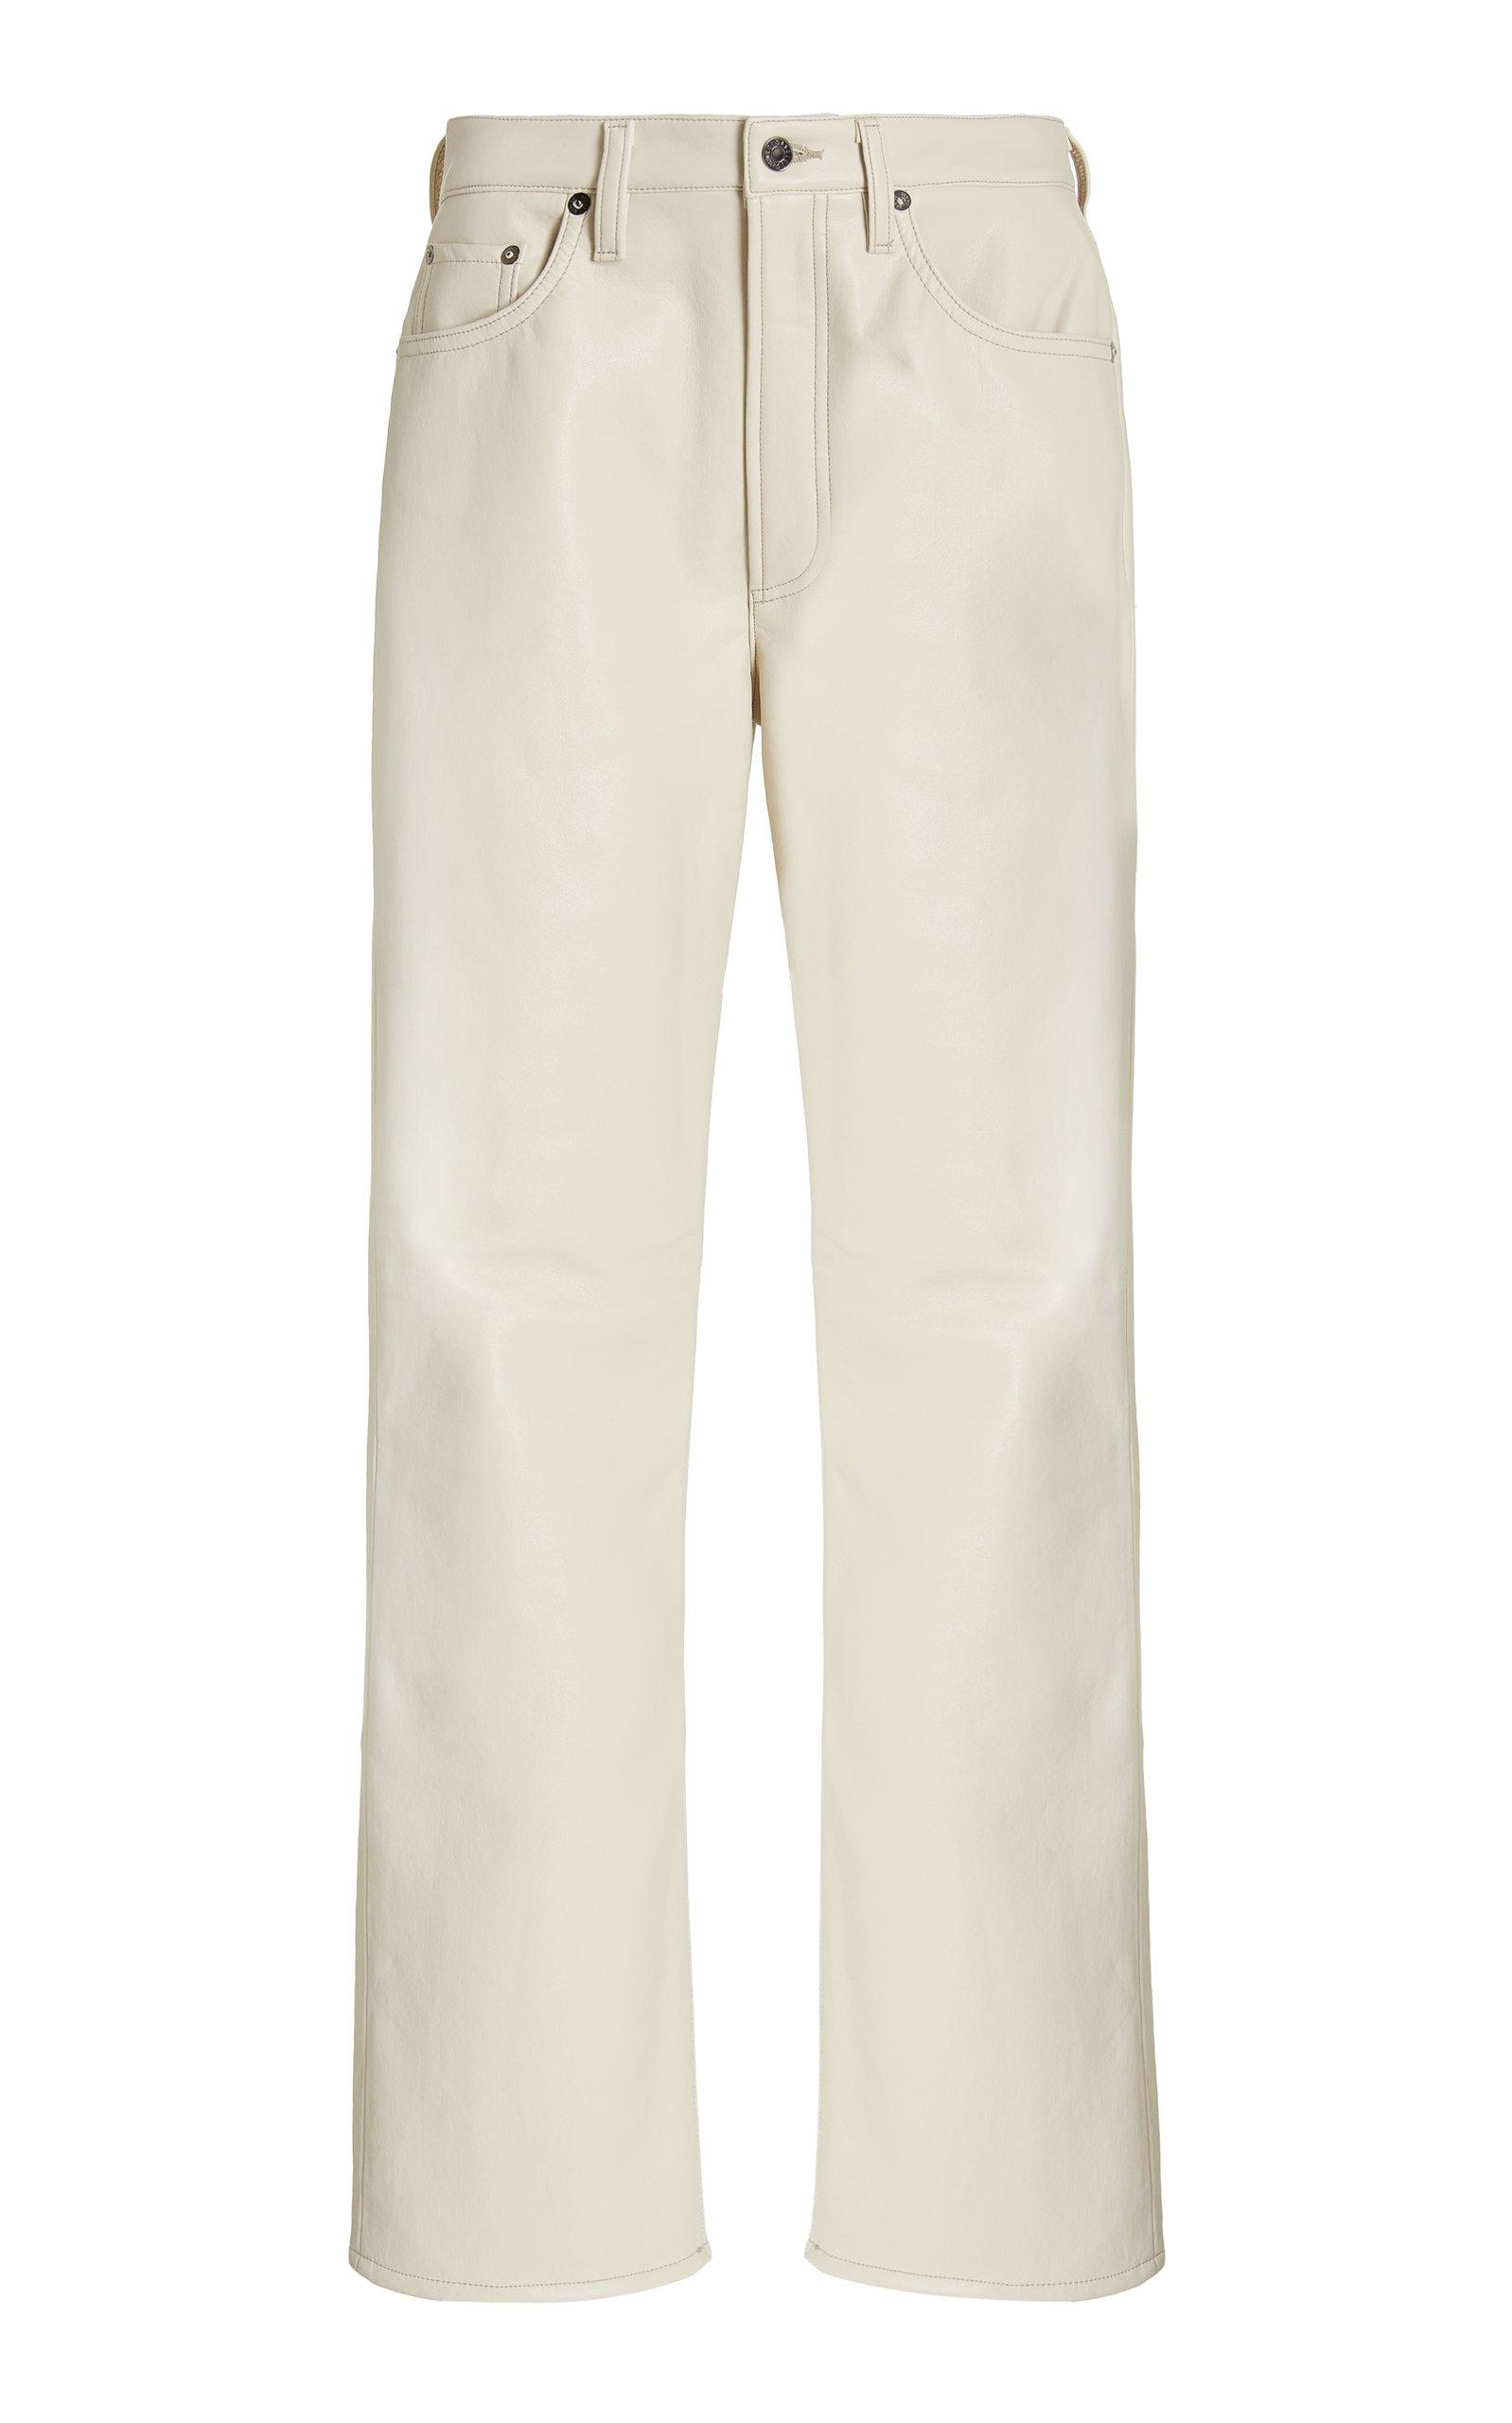 Agolde - Women's 90's Pinch-Waist High-Rise Recycled Leather Straight-Leg Pants - Neutral - Moda Operandi